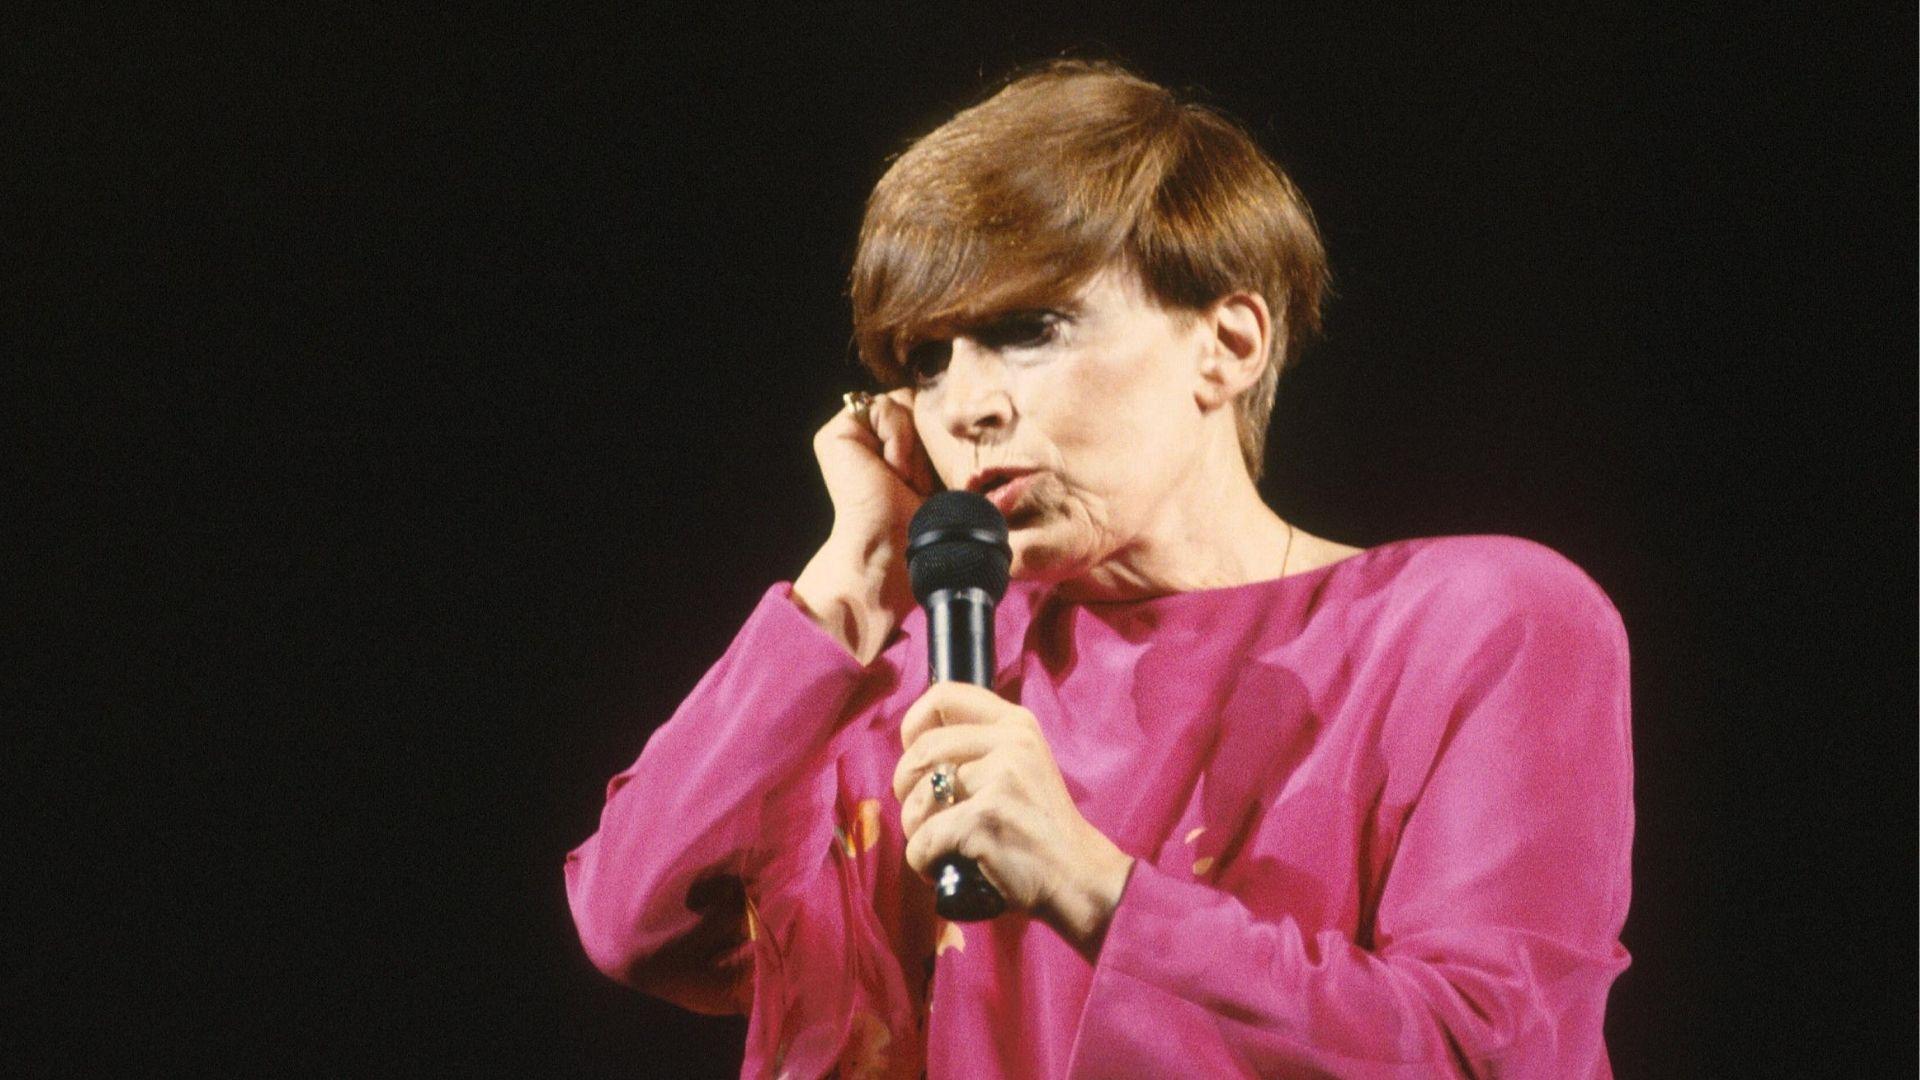 Addio a Franca Valeri, Viva la Franca!